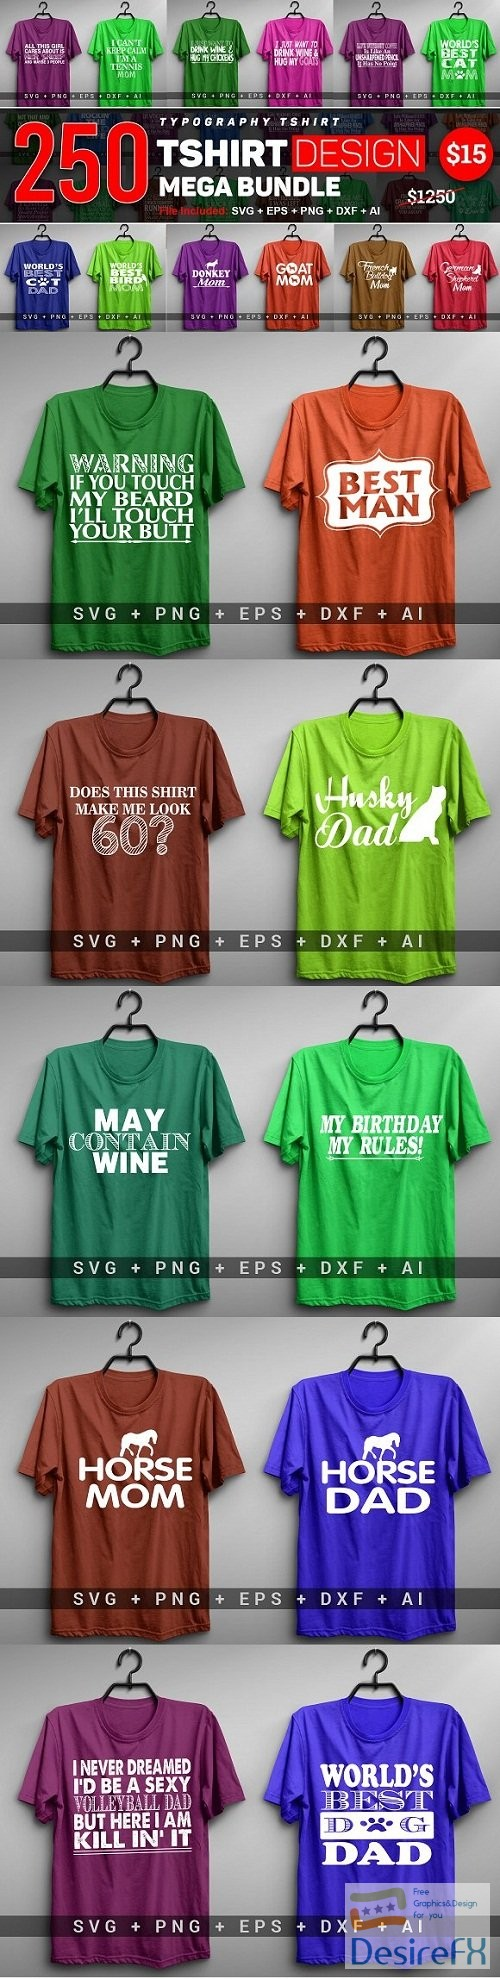 t-shirts-prints - 250 Funny T-shirt Typography - 3423426